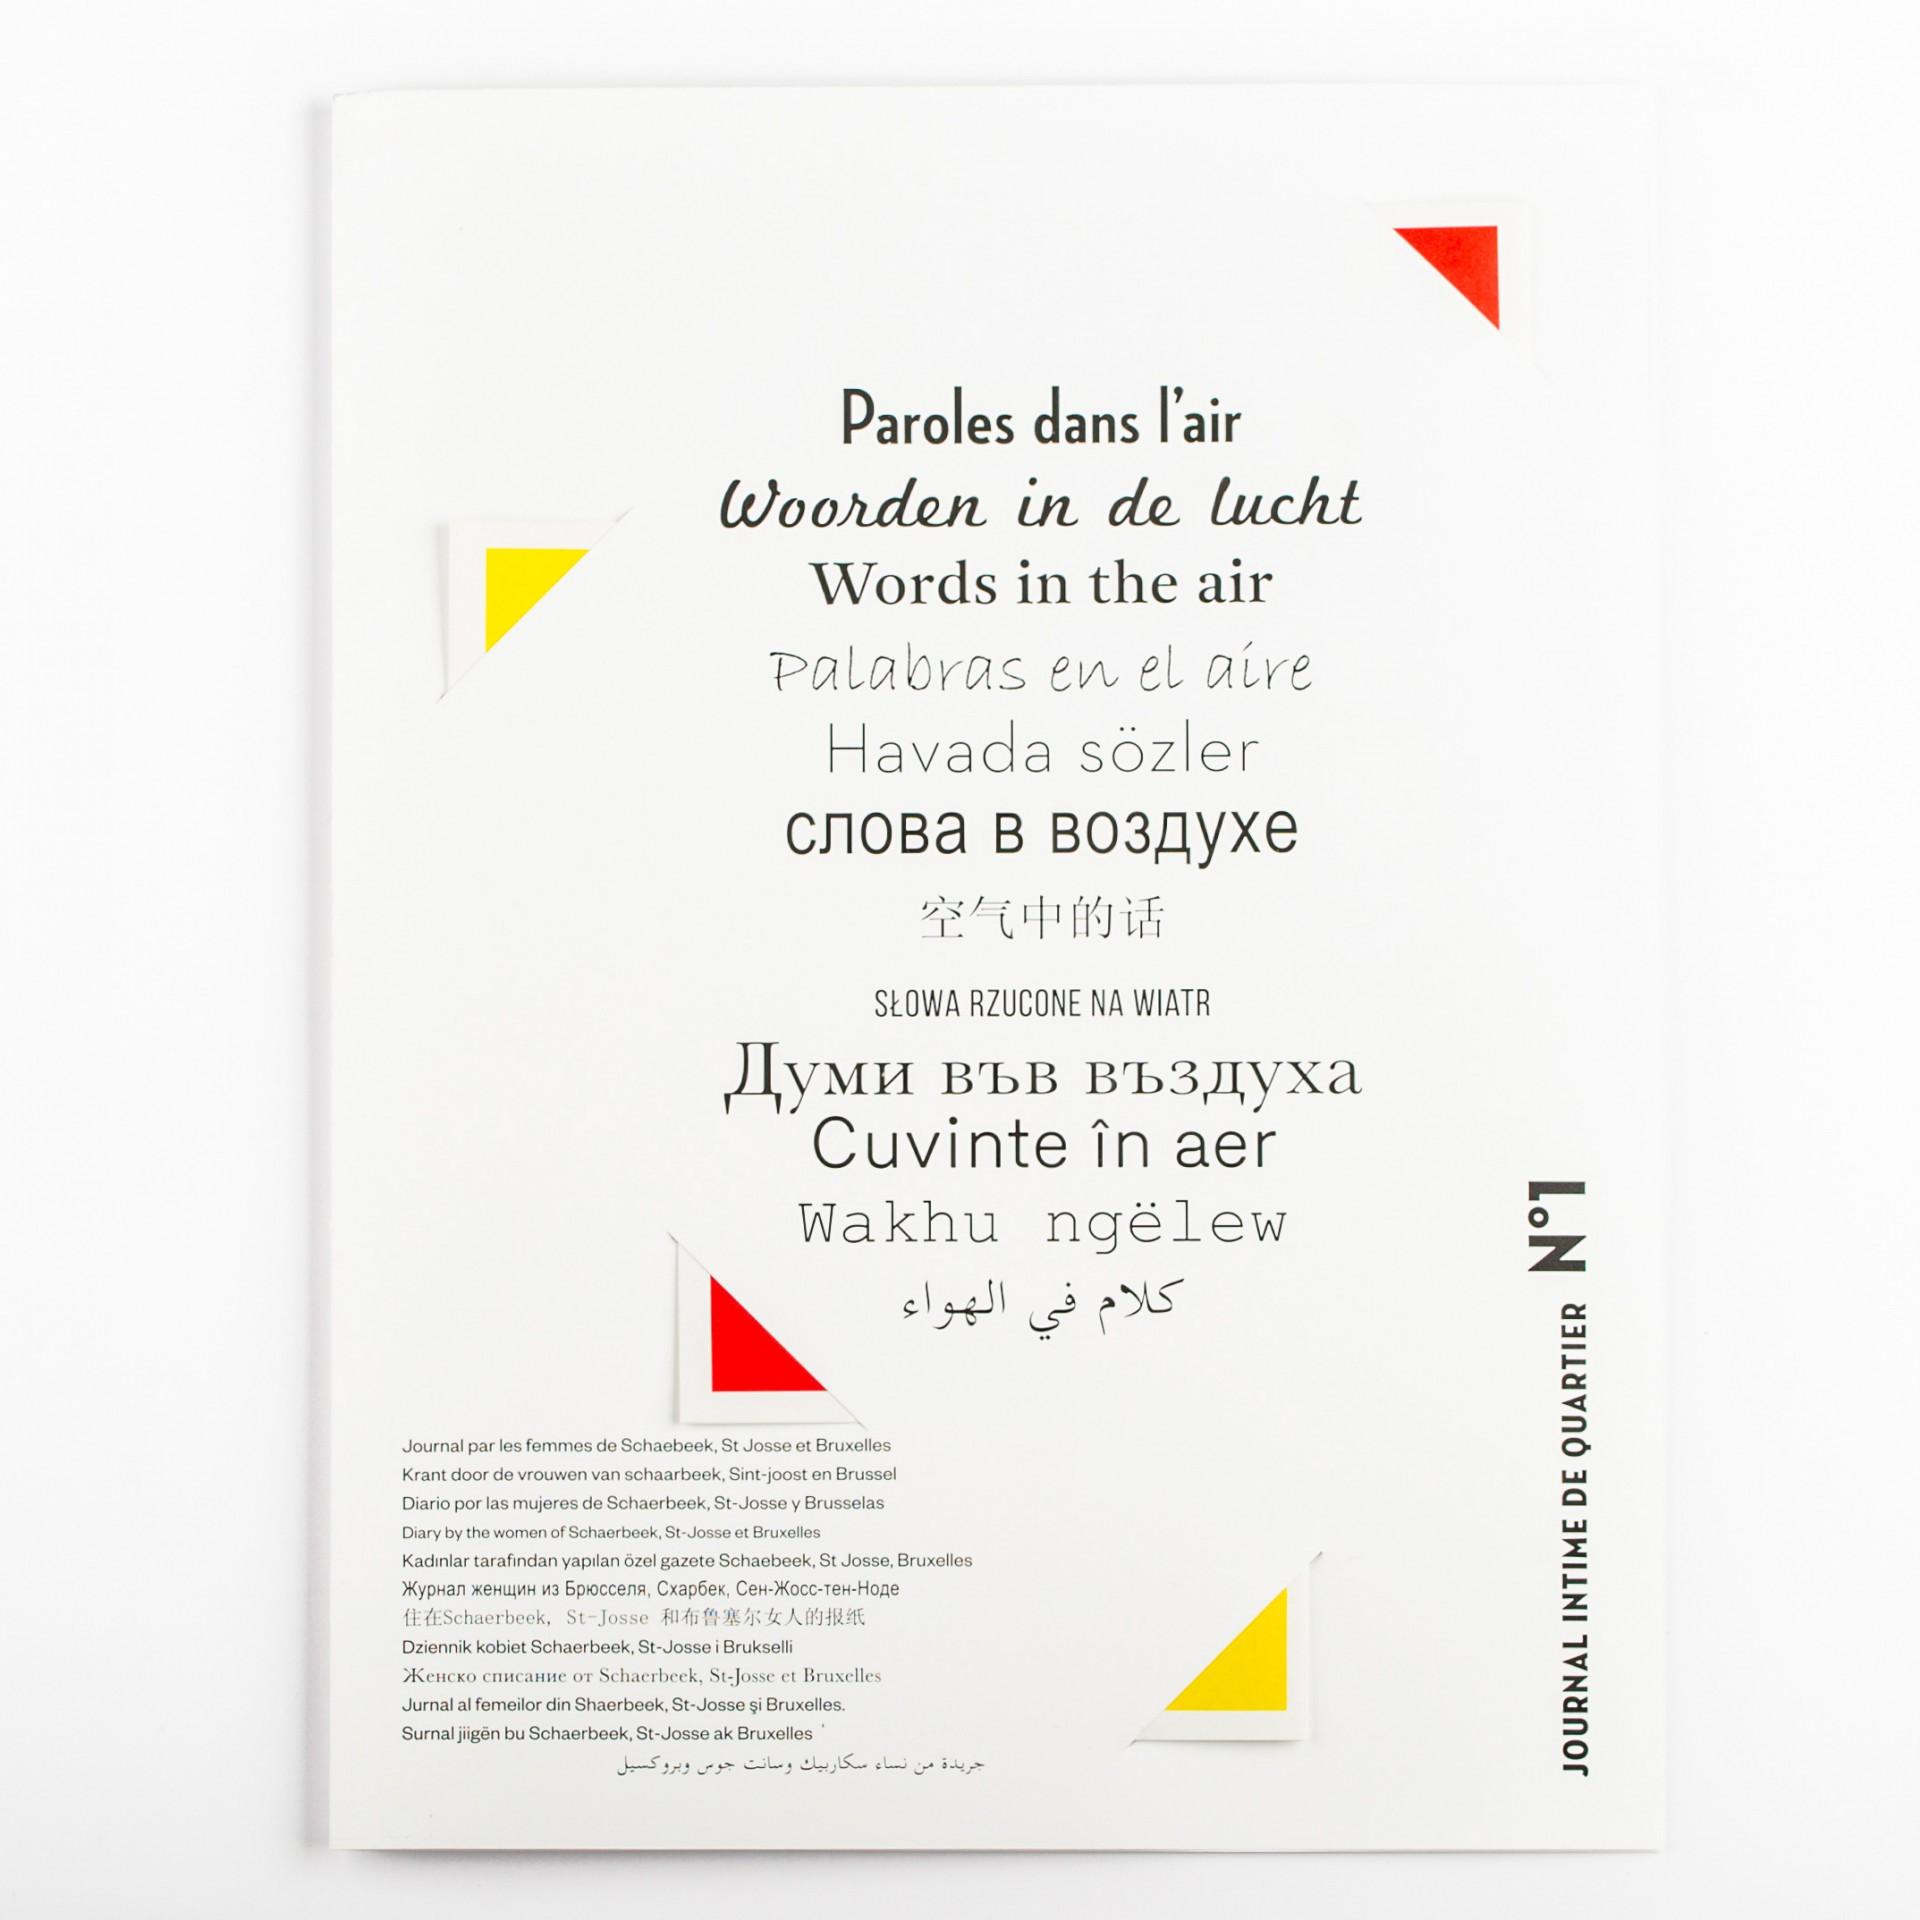 Watermael-Boitsfort, Ville des Mots 2018 Journal intime de quartier